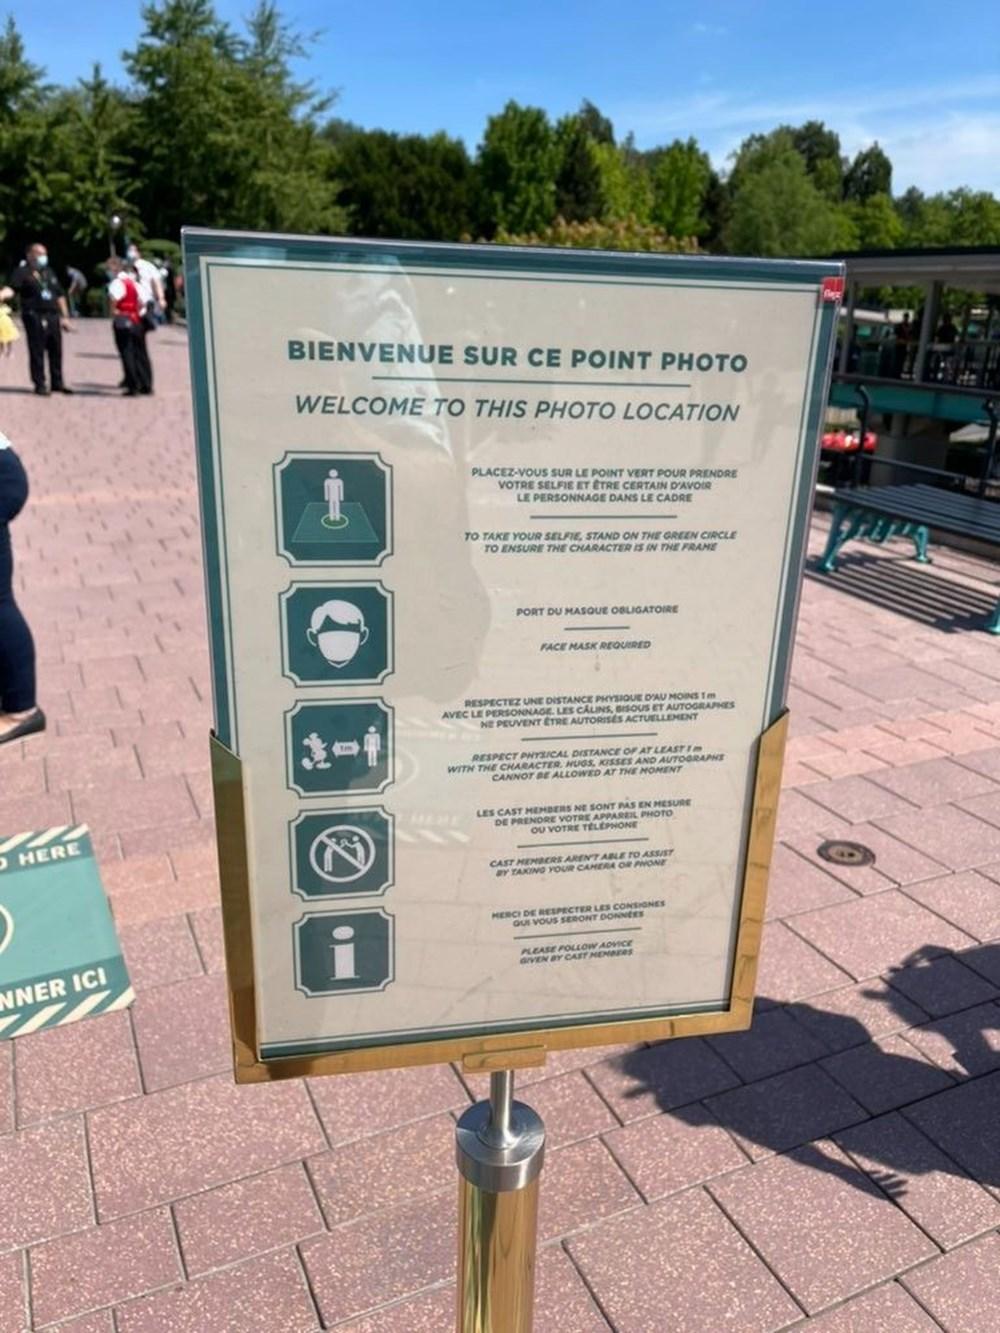 Disneyland Paris reopened after 7.5 months - 11